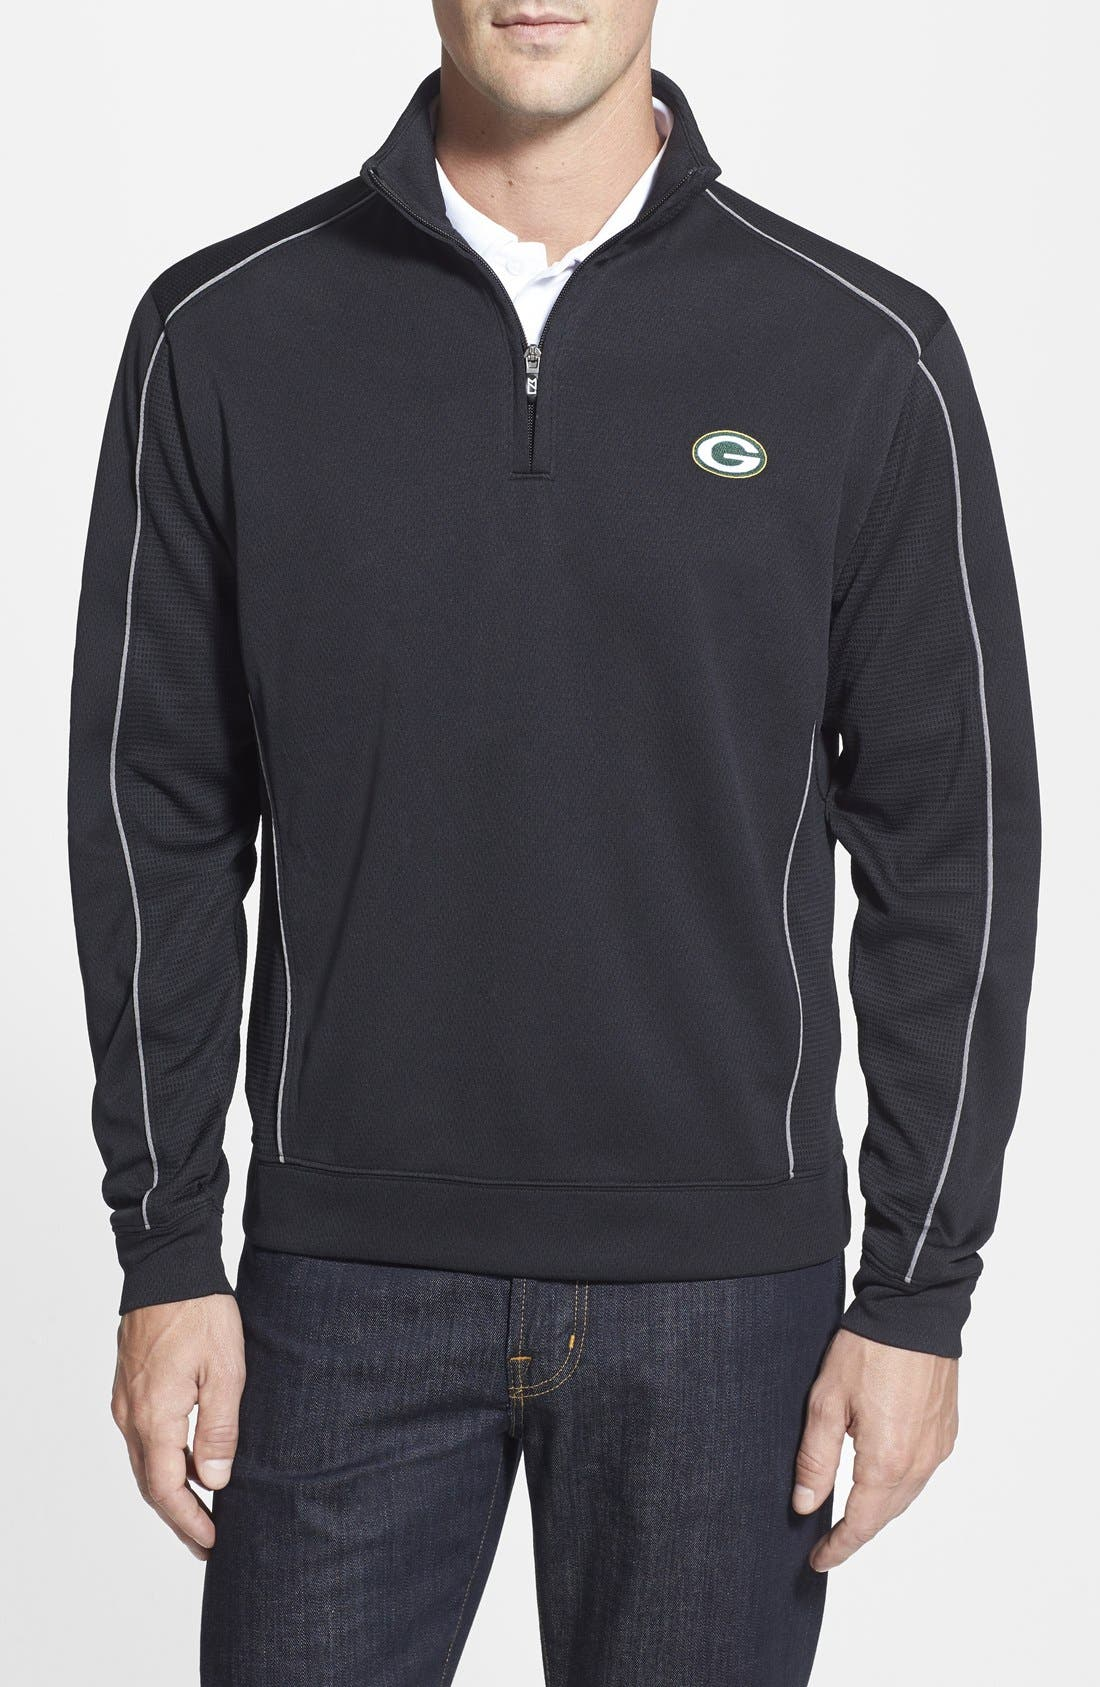 Cutter & Buck Green Bay Packers - Edge DryTec Moisture Wicking Half Zip Pullover